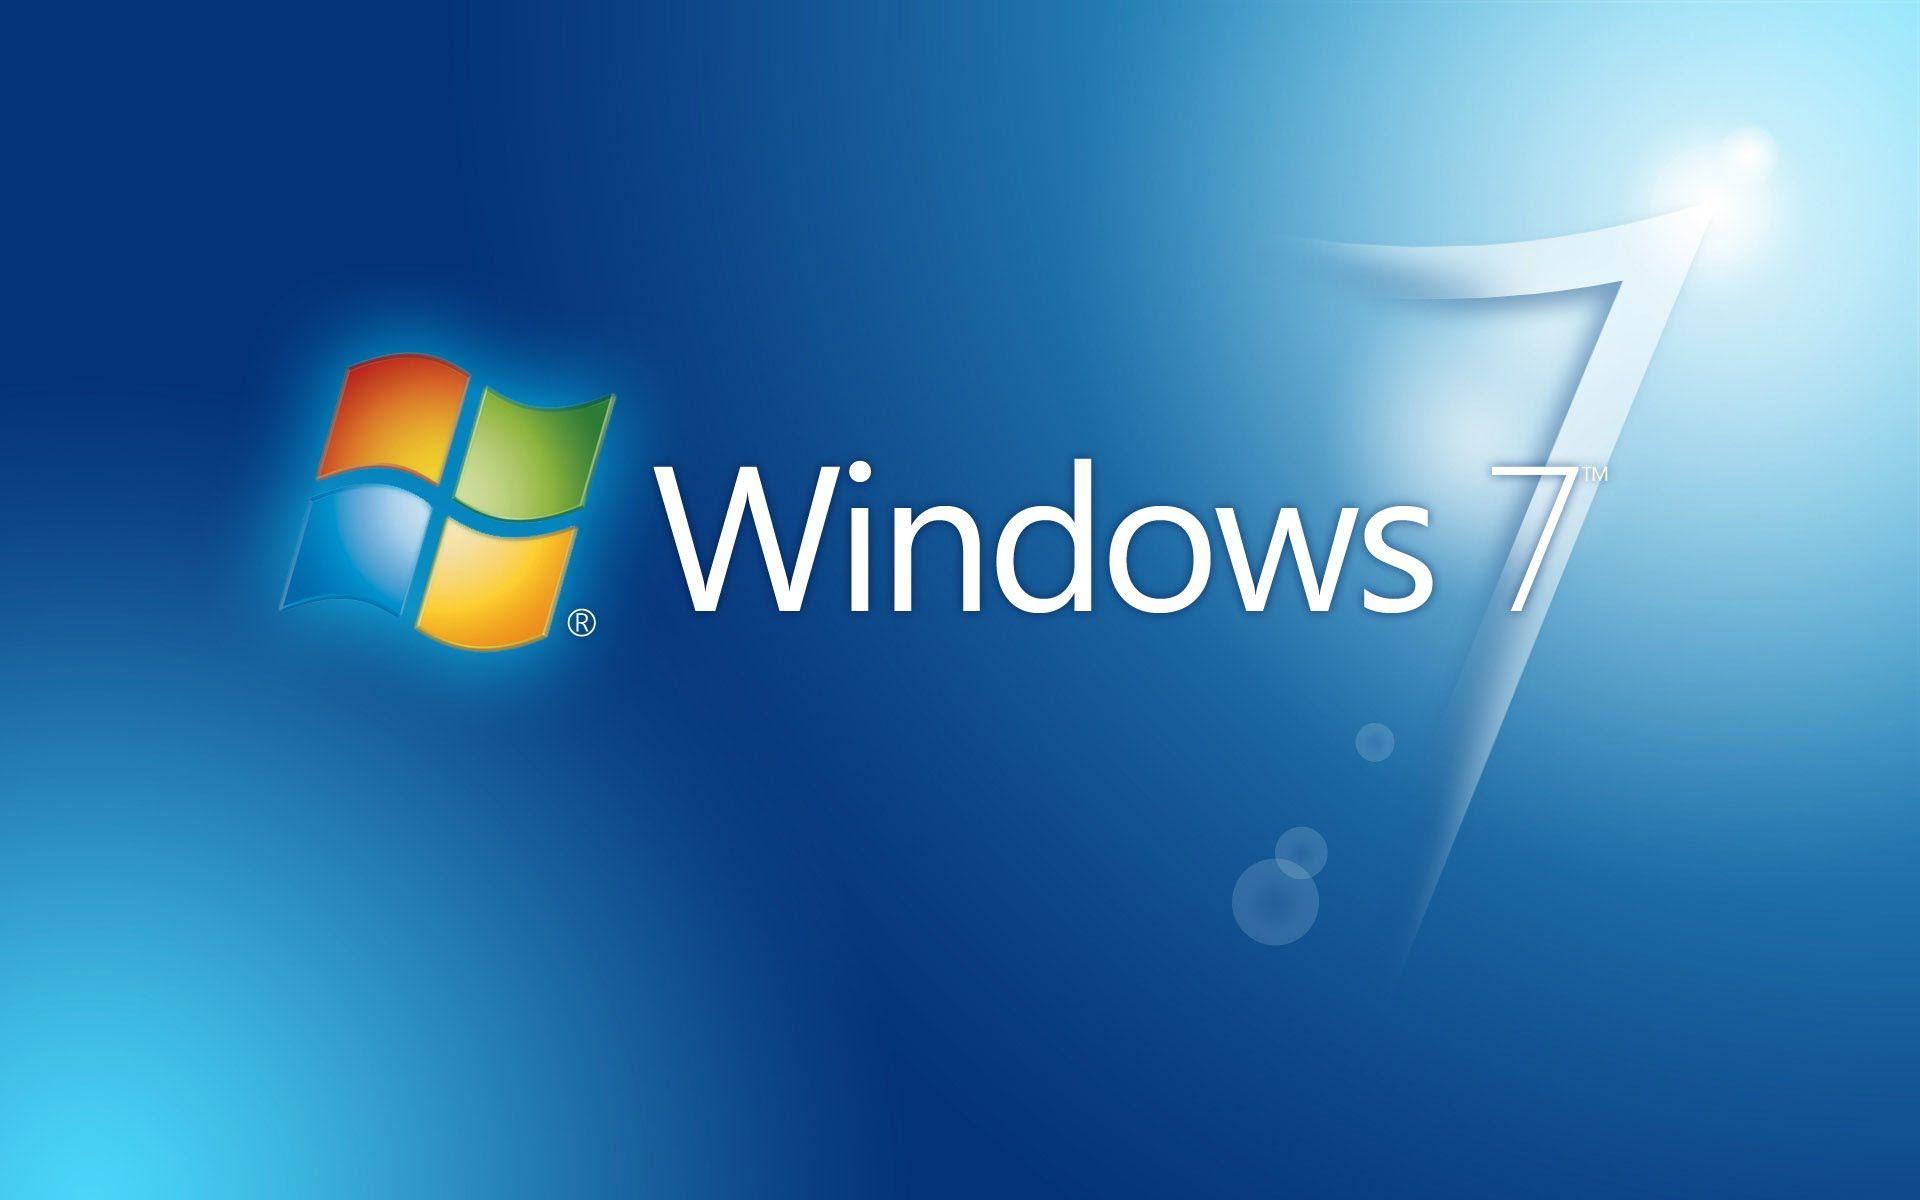 Window 7 Desktop Backgrounds Wallpapers Microsoft Windows Windows 7 Themes Windows